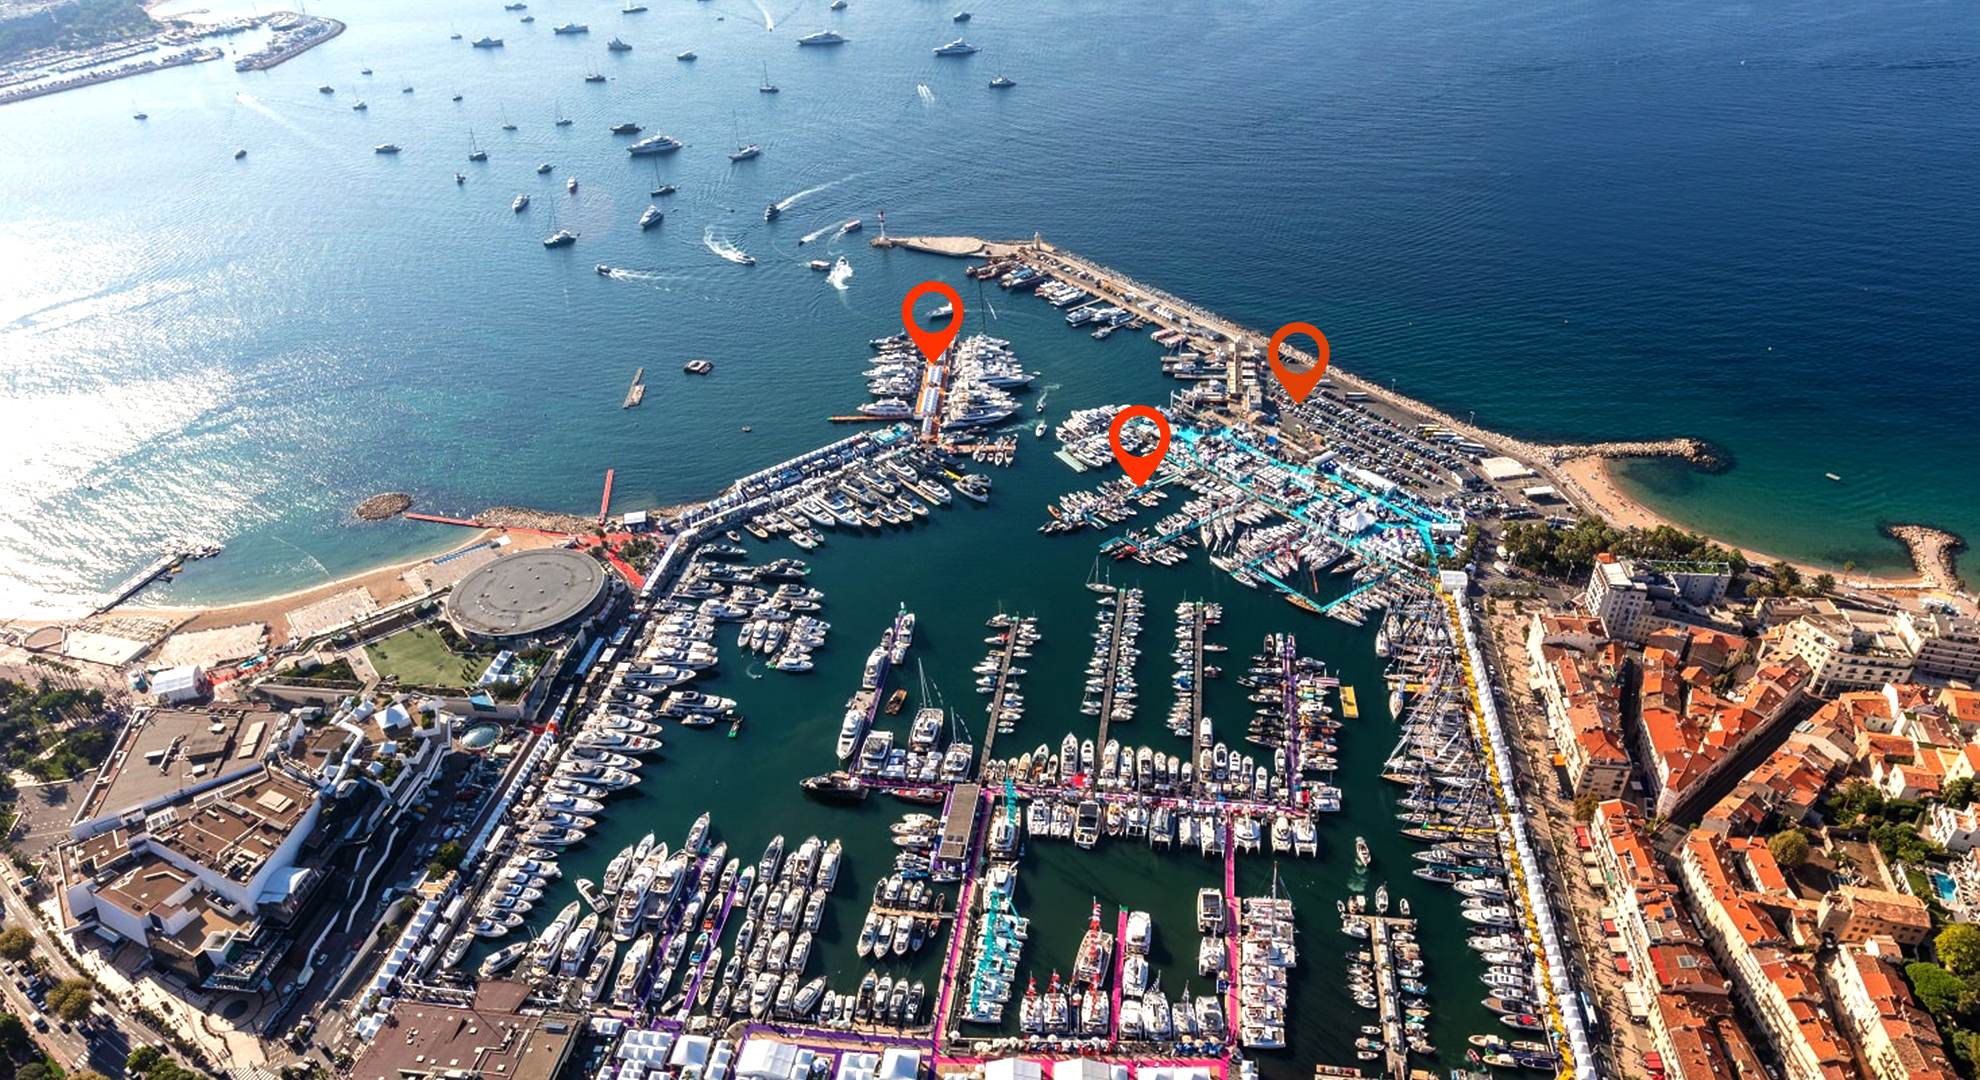 Gulf Craft   Luxury Yachts & Boat Manufacturer in Dubai, UAE